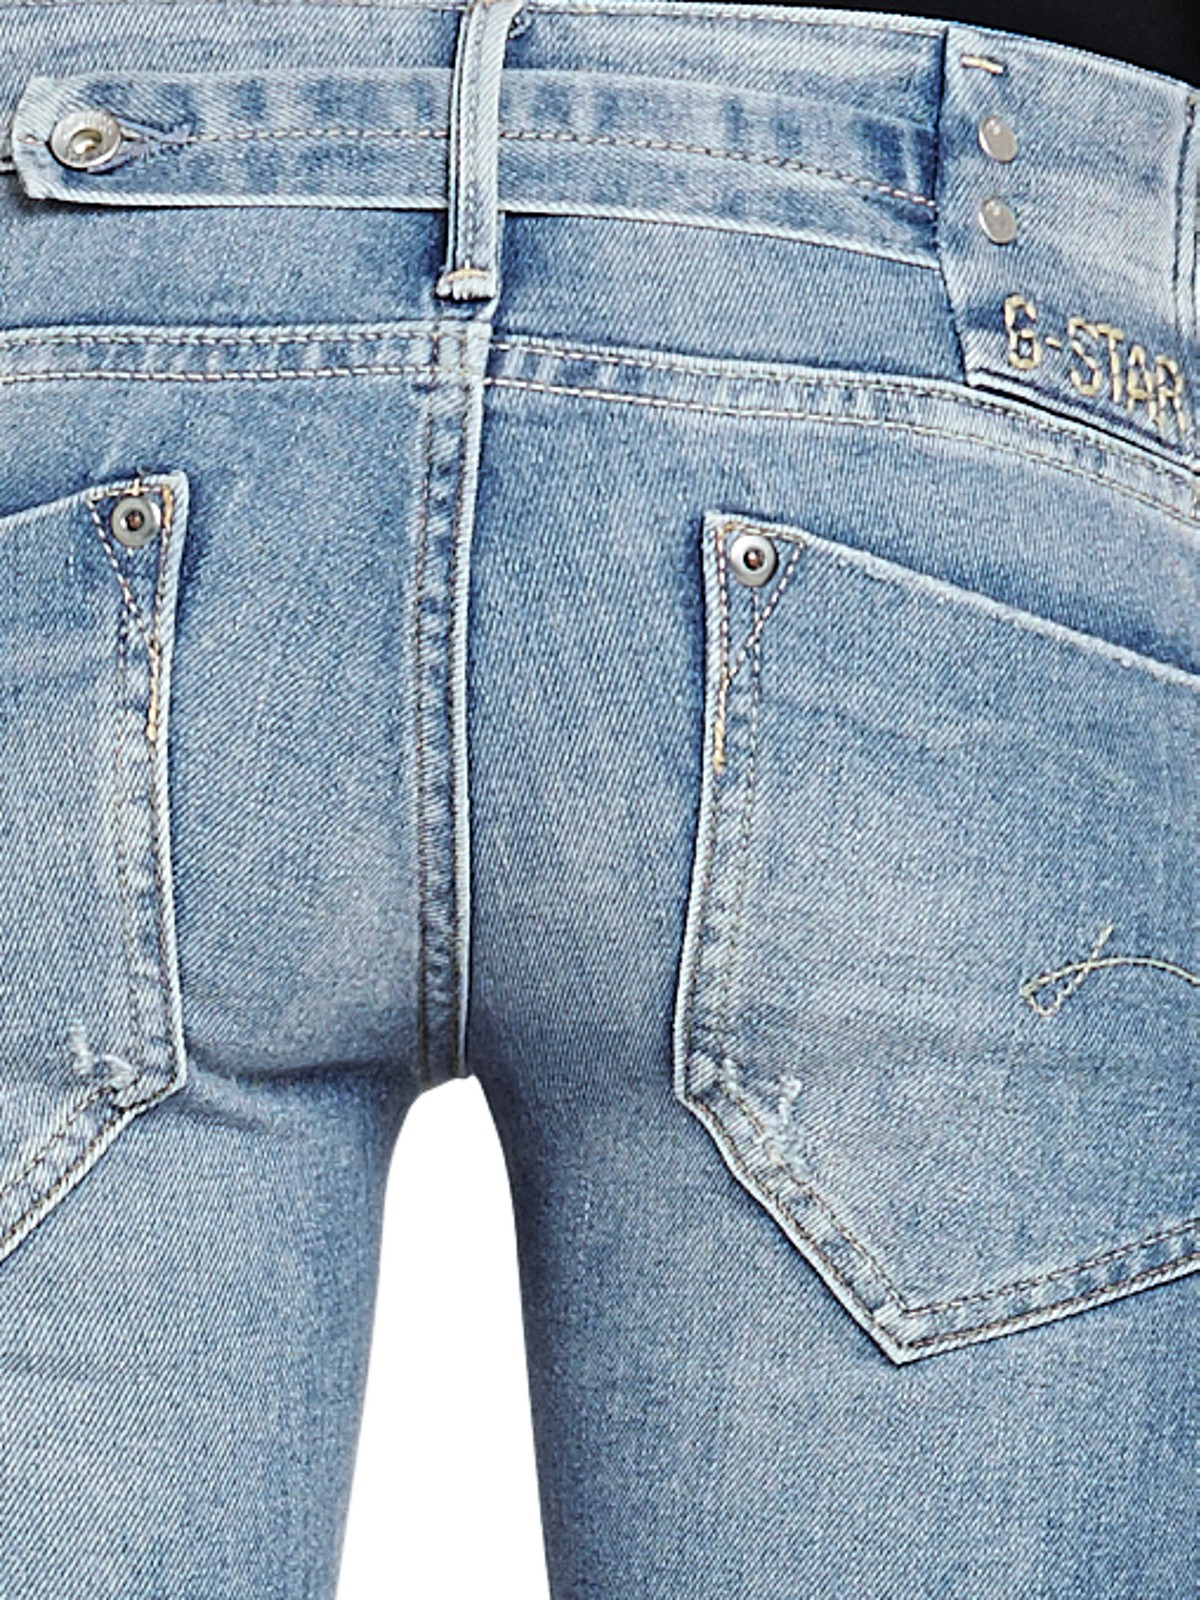 g star raw midge straight leg jeans in blue medium aged. Black Bedroom Furniture Sets. Home Design Ideas